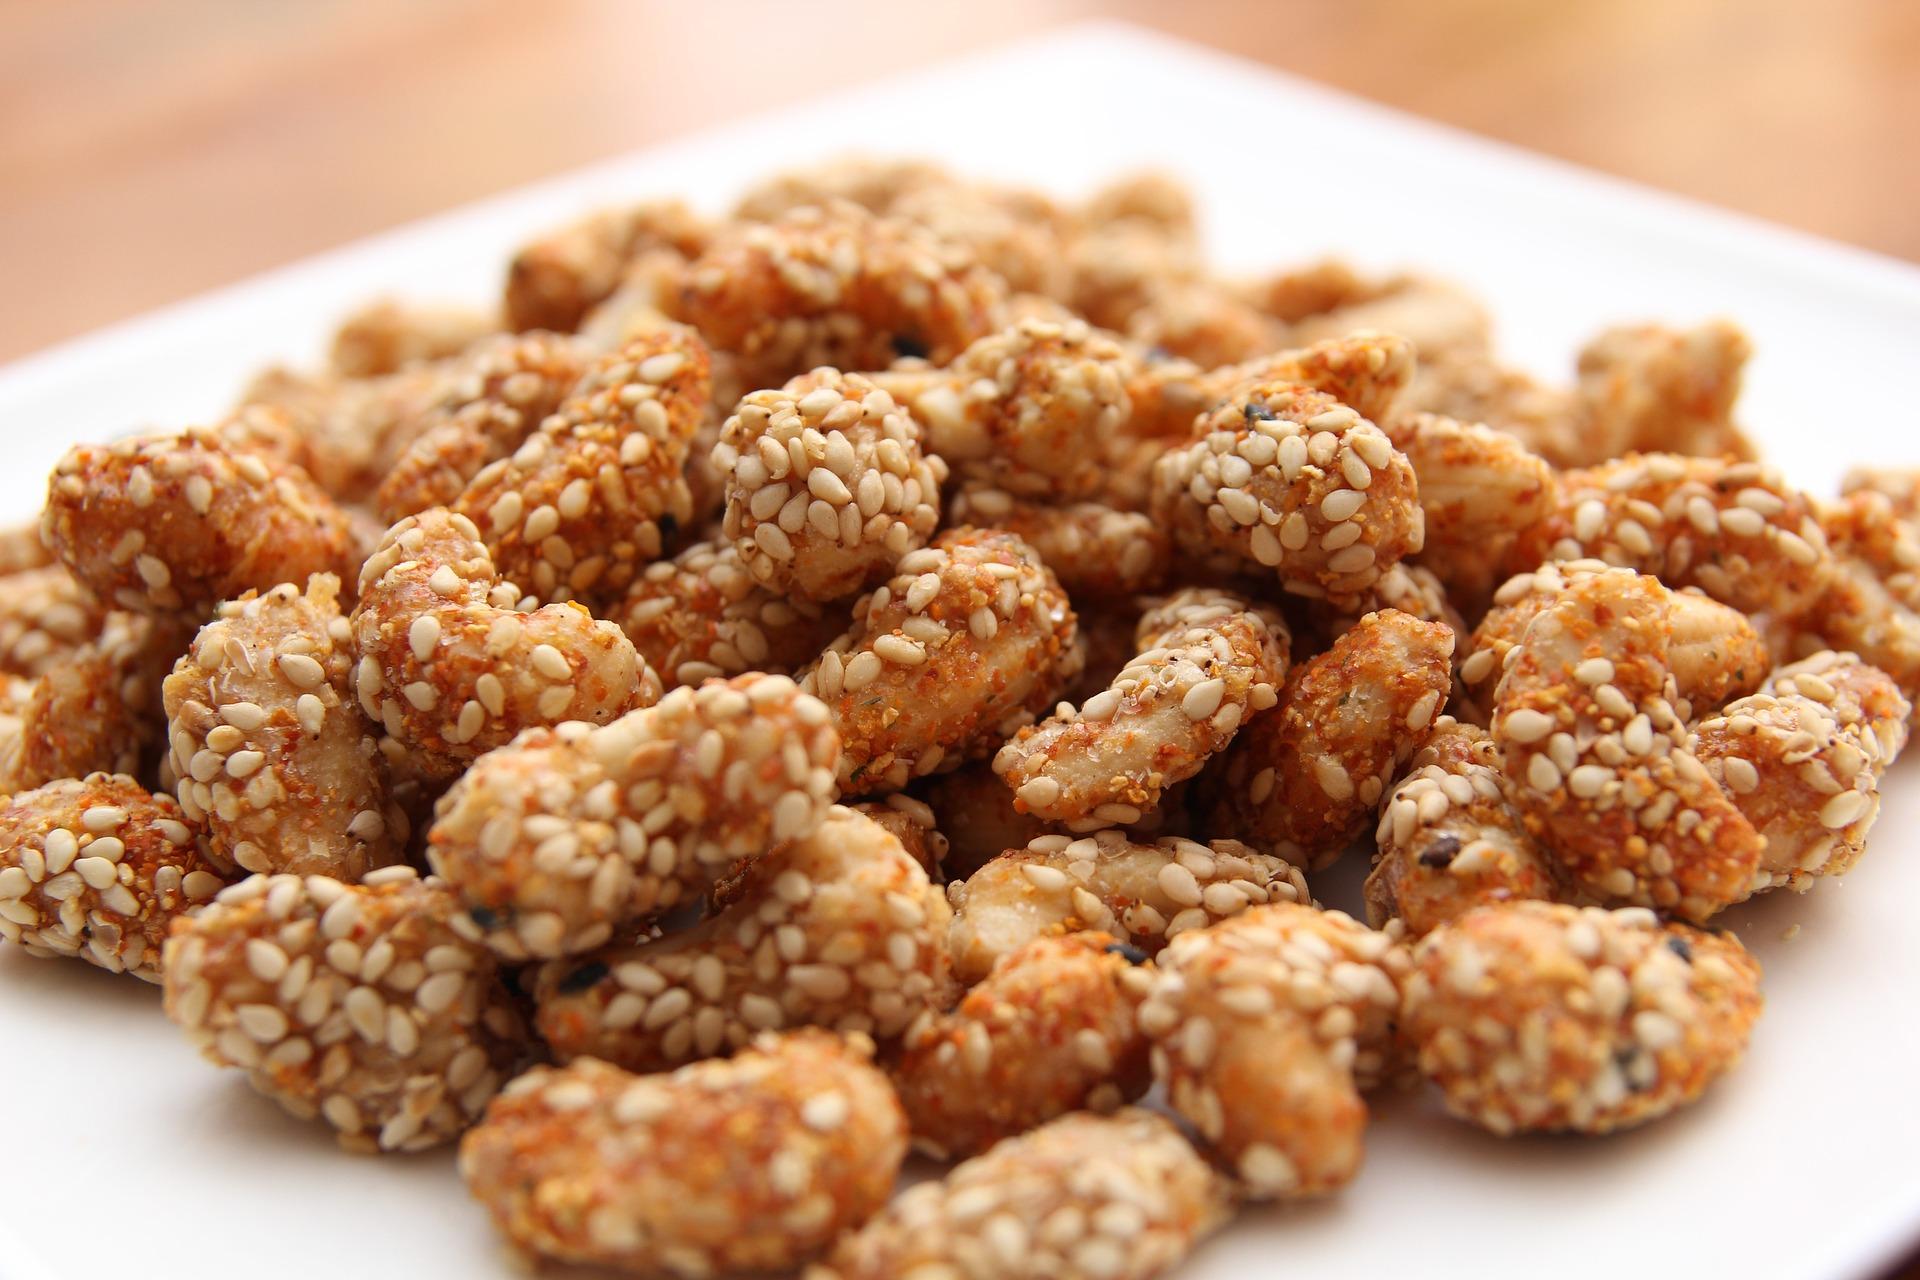 kalorienreiche-lebensmittel Zunehm-Blog